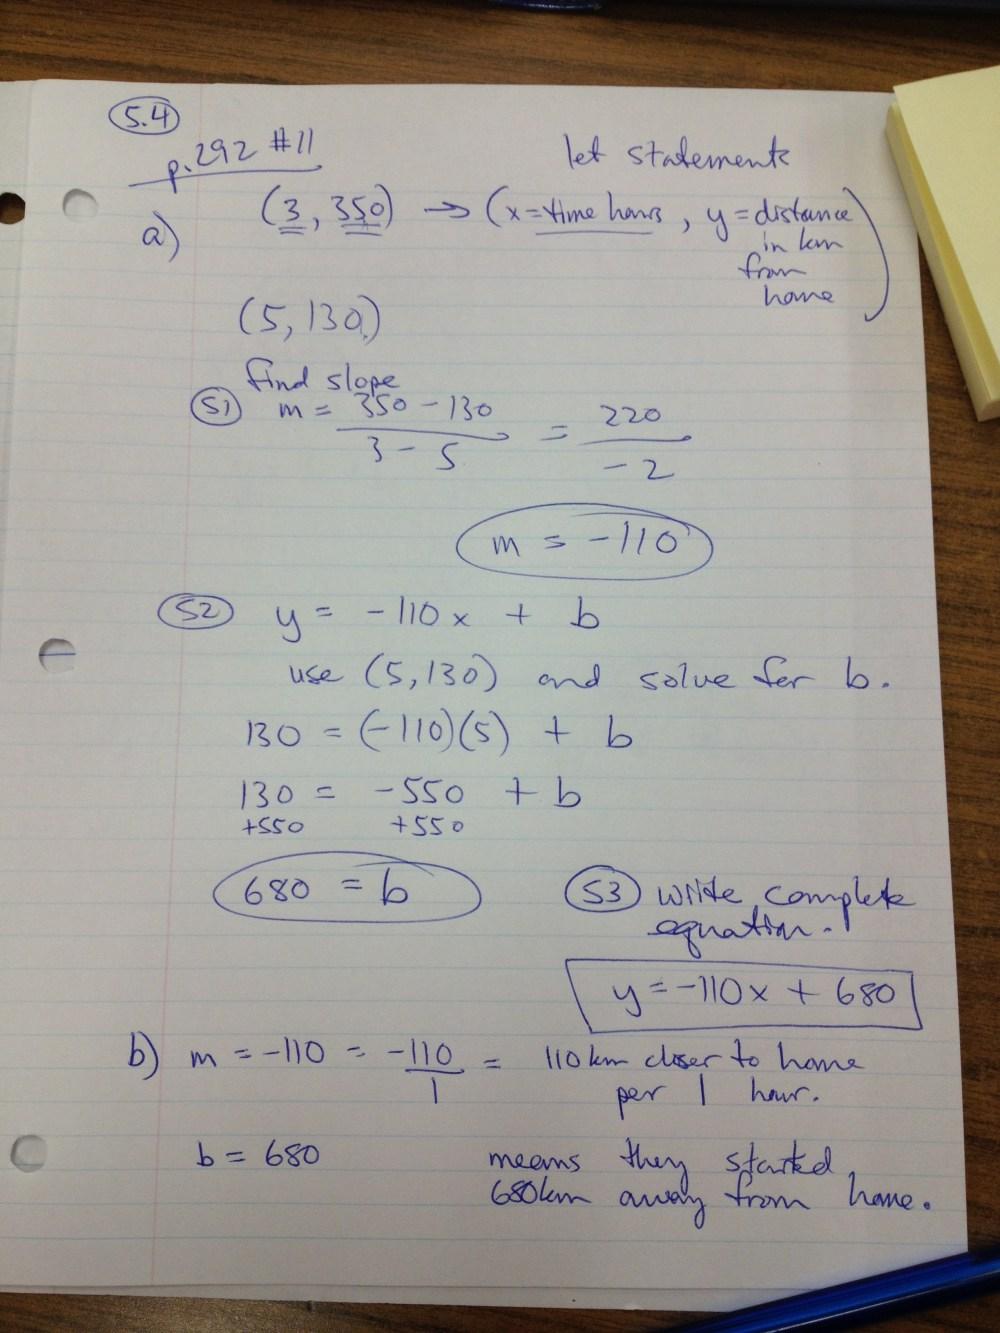 medium resolution of needmathhelp.com ... grade 9 mathematics ... The path is full of numbers.